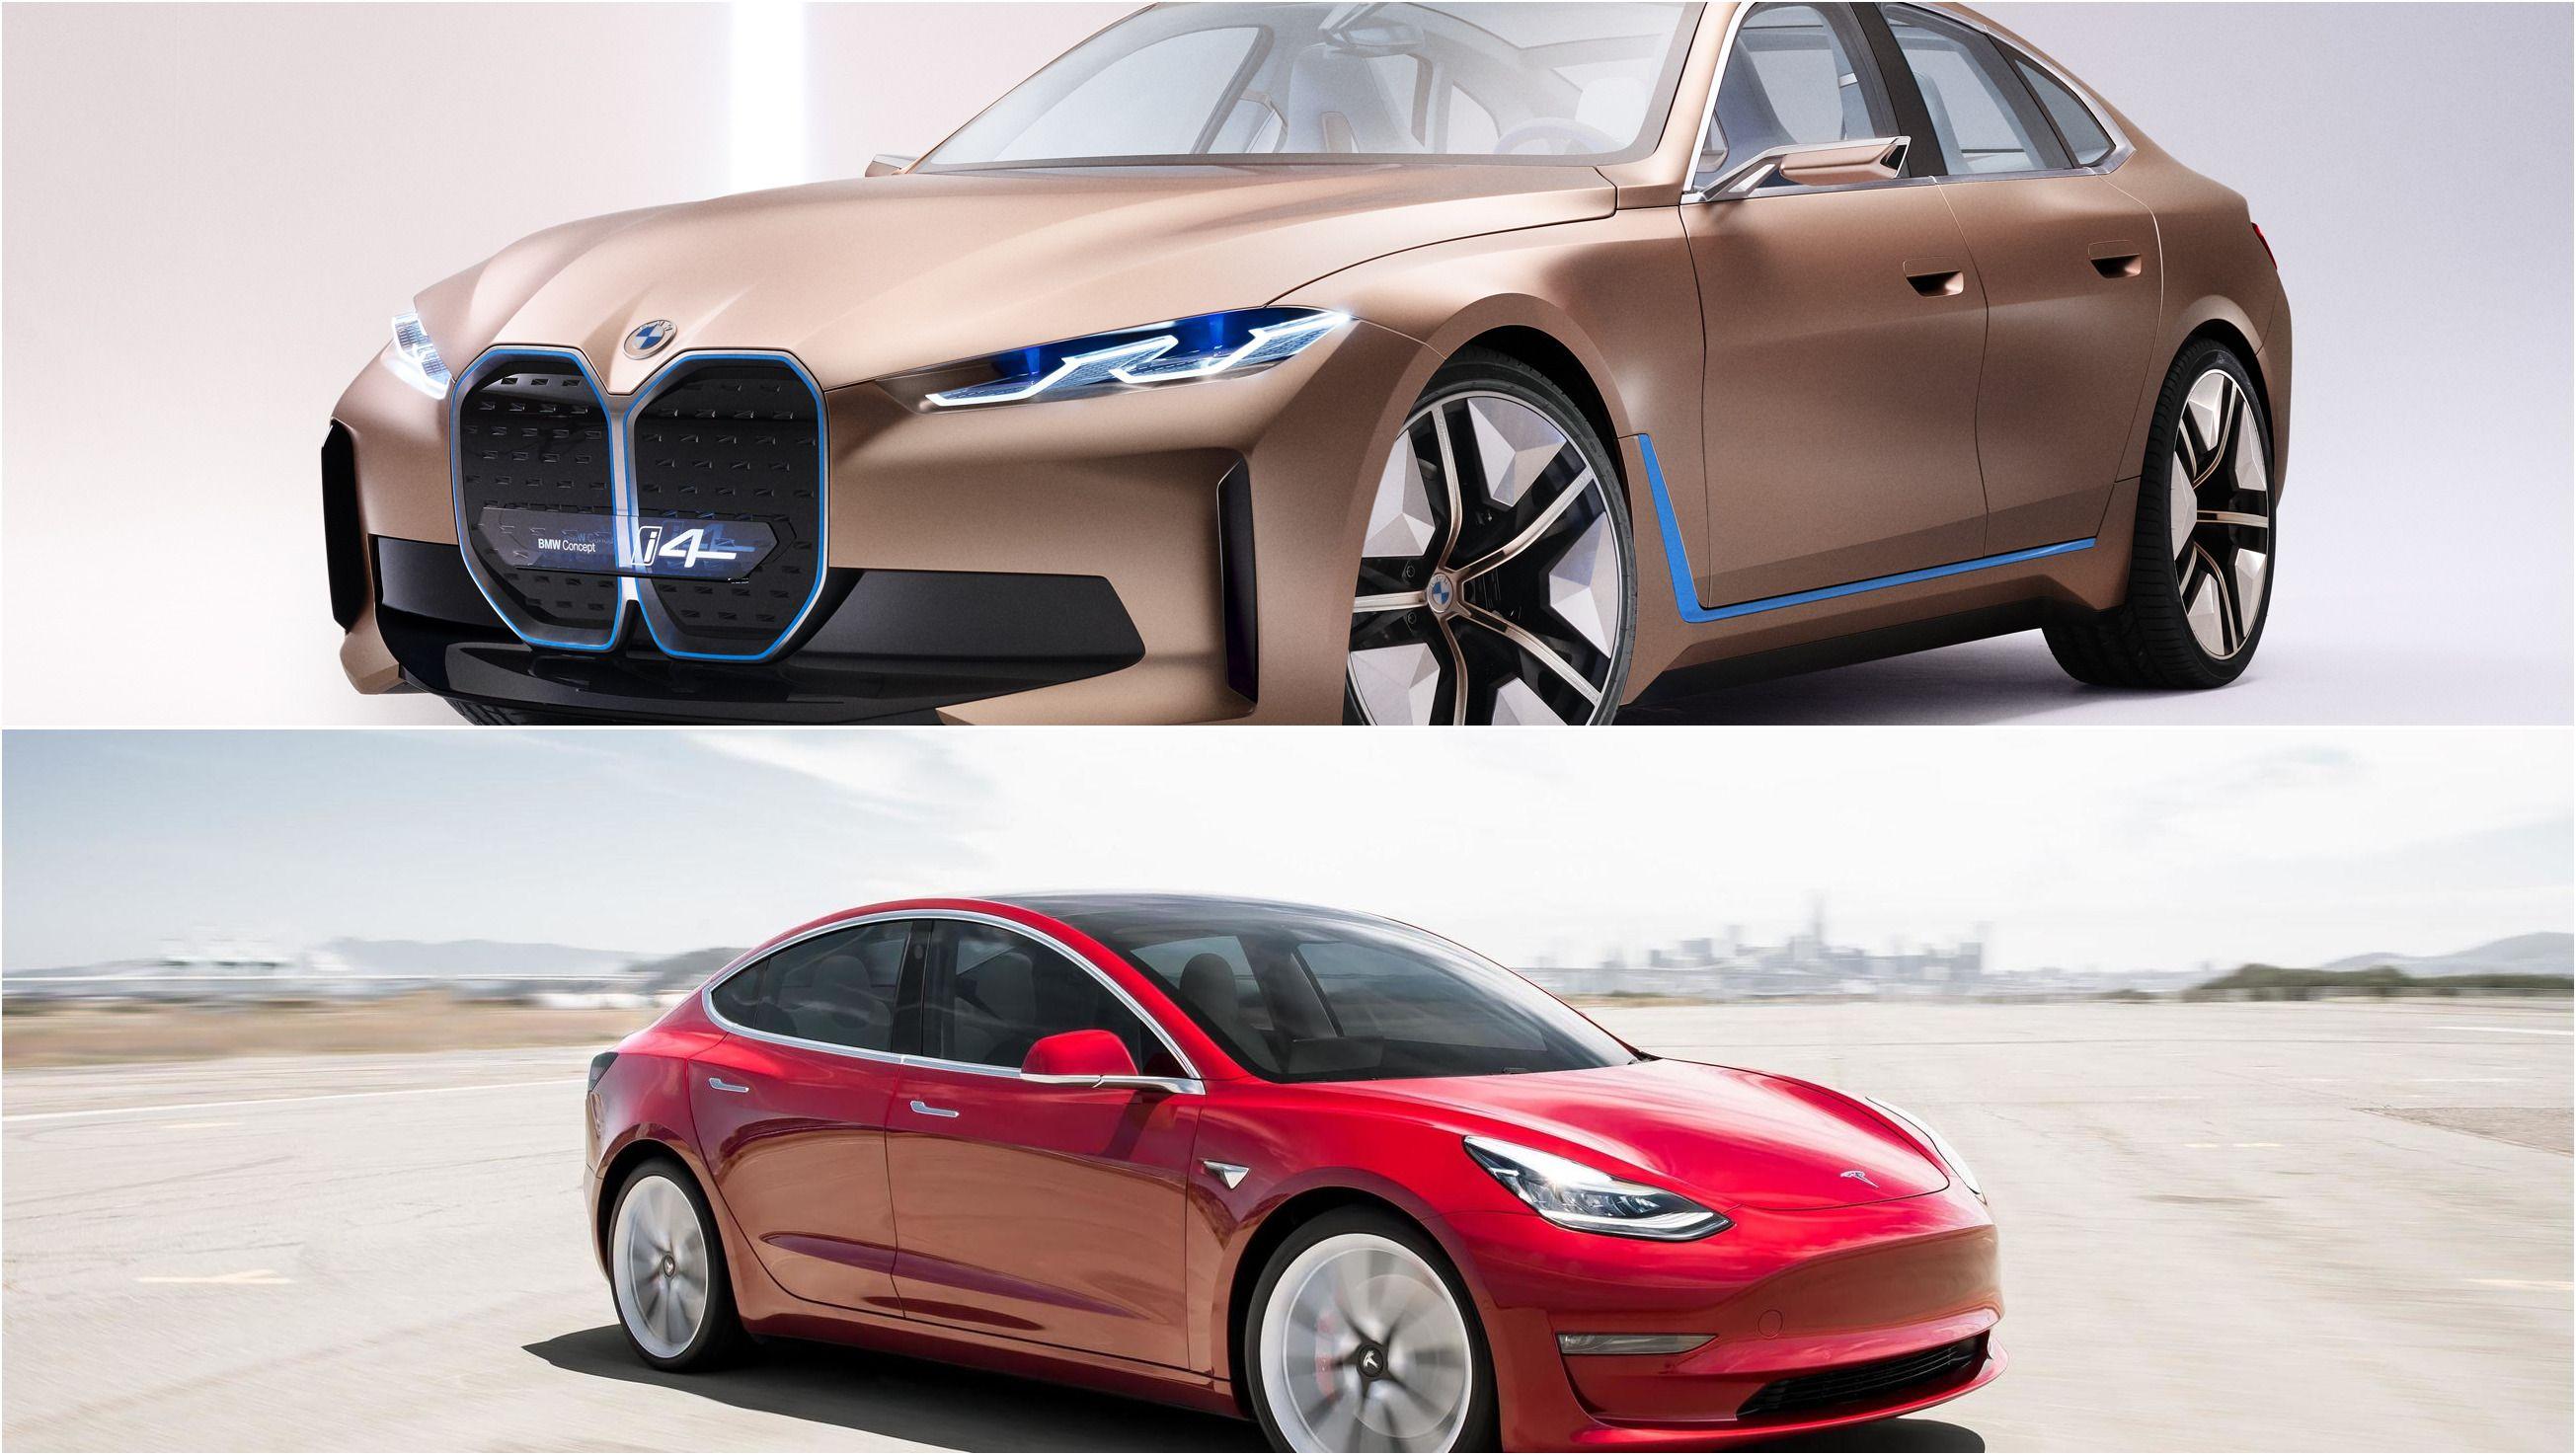 2021 Bmw I4 Vs 2020 Tesla Model 3 Top Speed In 2020 Tesla Model Bmw Tesla